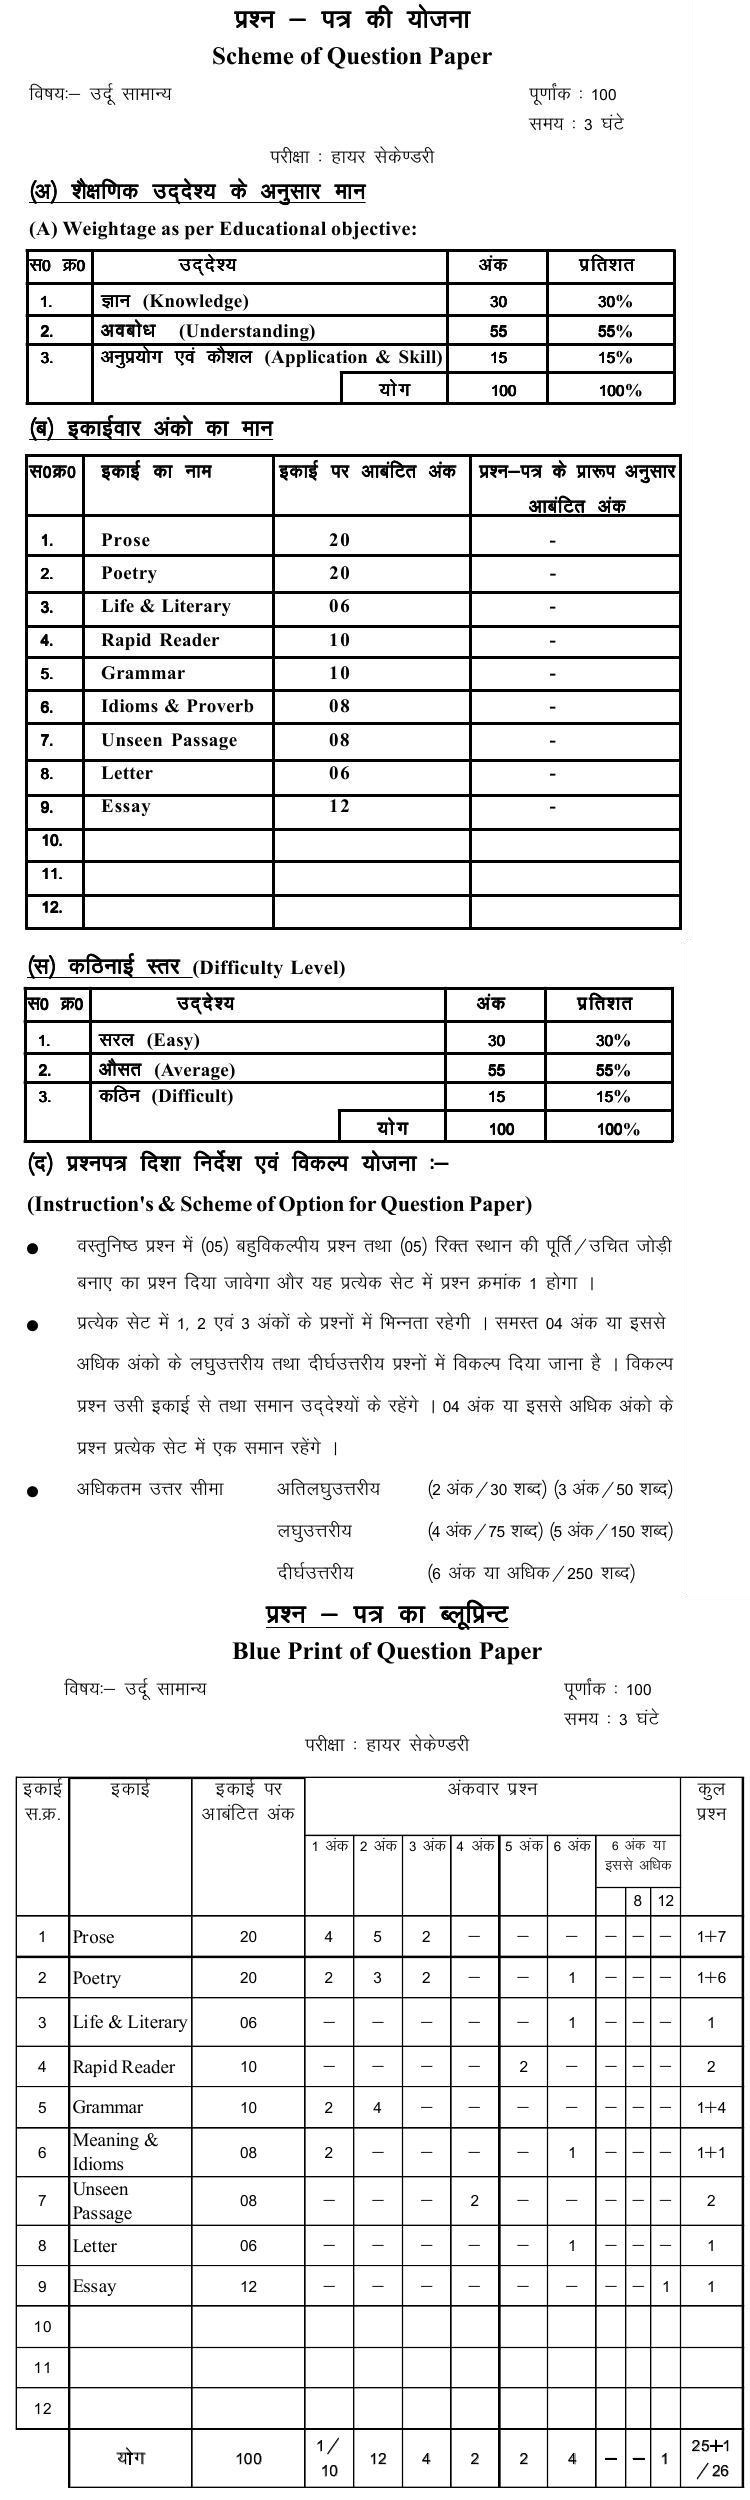 Chattisgarh Board Class 12 Scheme and Blue Print of Urdu General